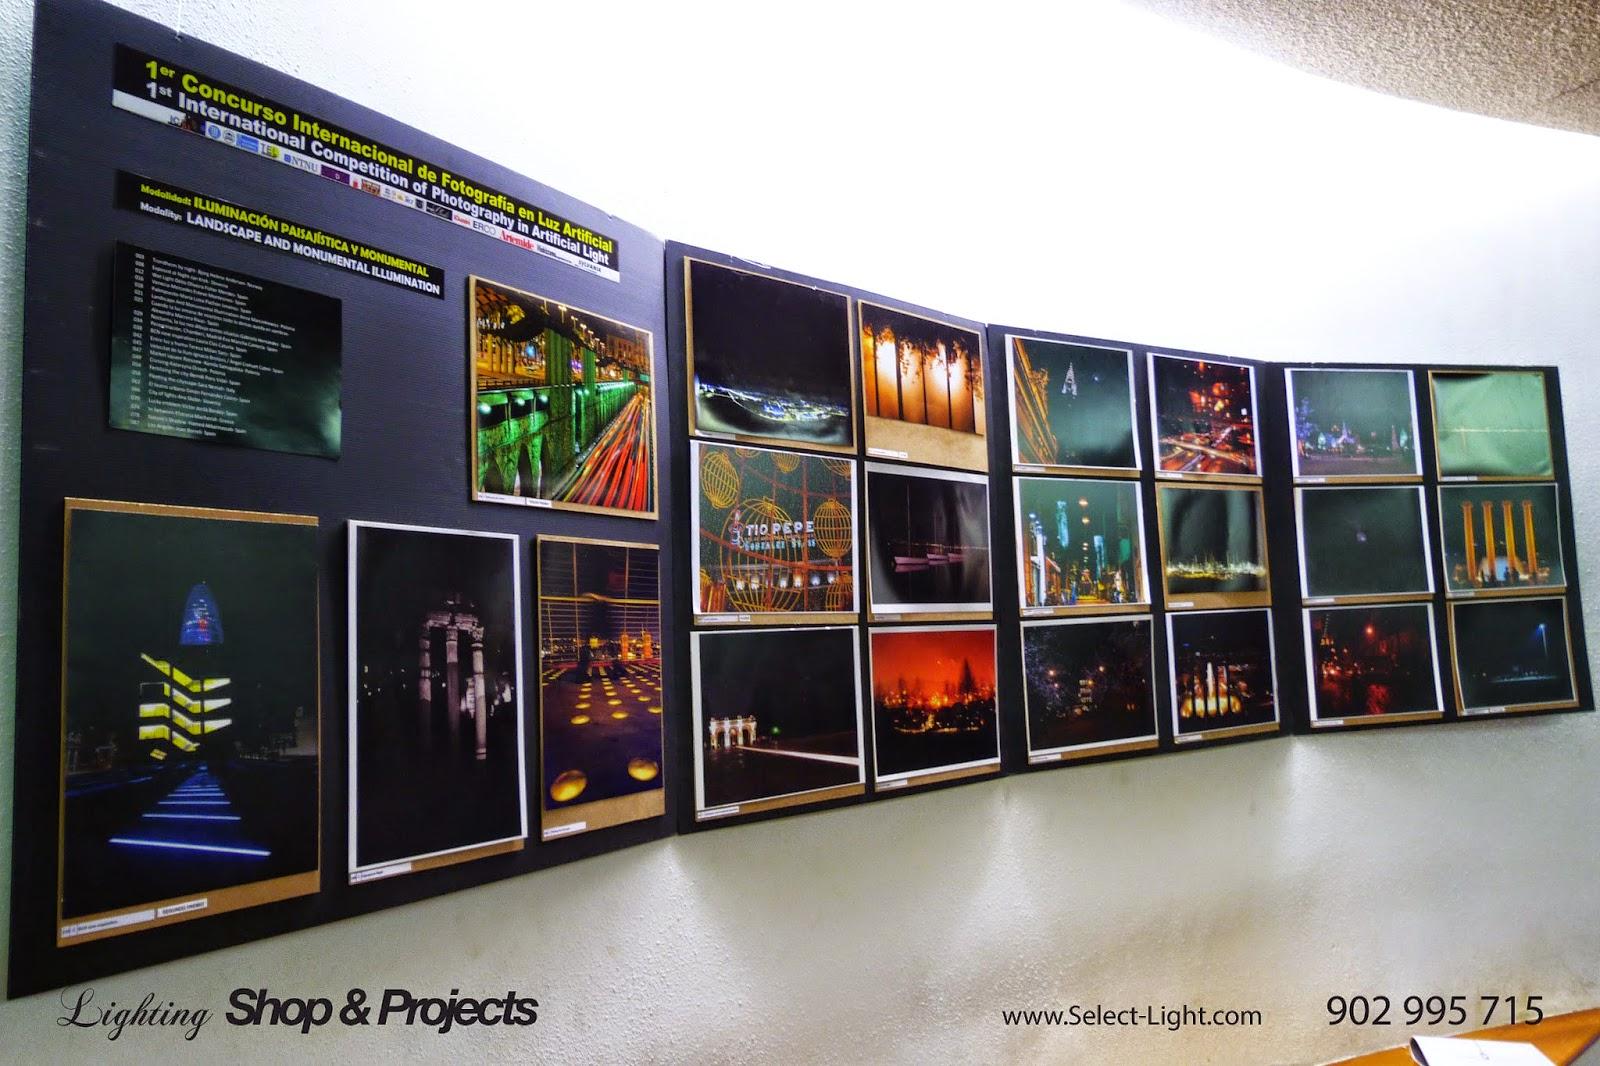 1er concurso internacional de fotografia en luz artificial